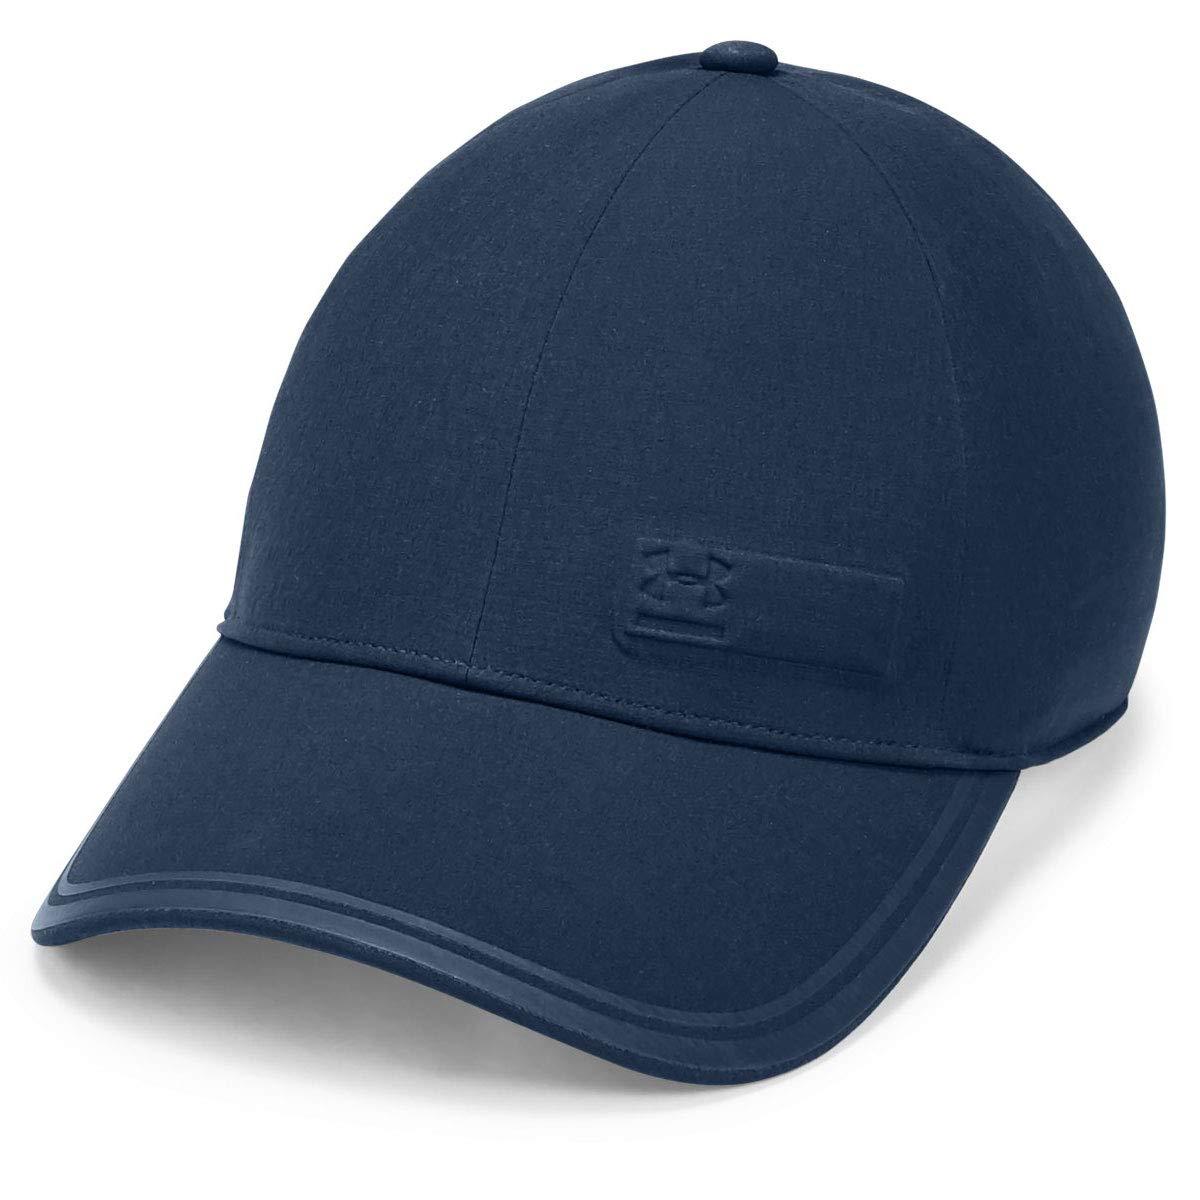 Under Armour New World Golf Hat Sombrero, Hombre: Amazon.es ...